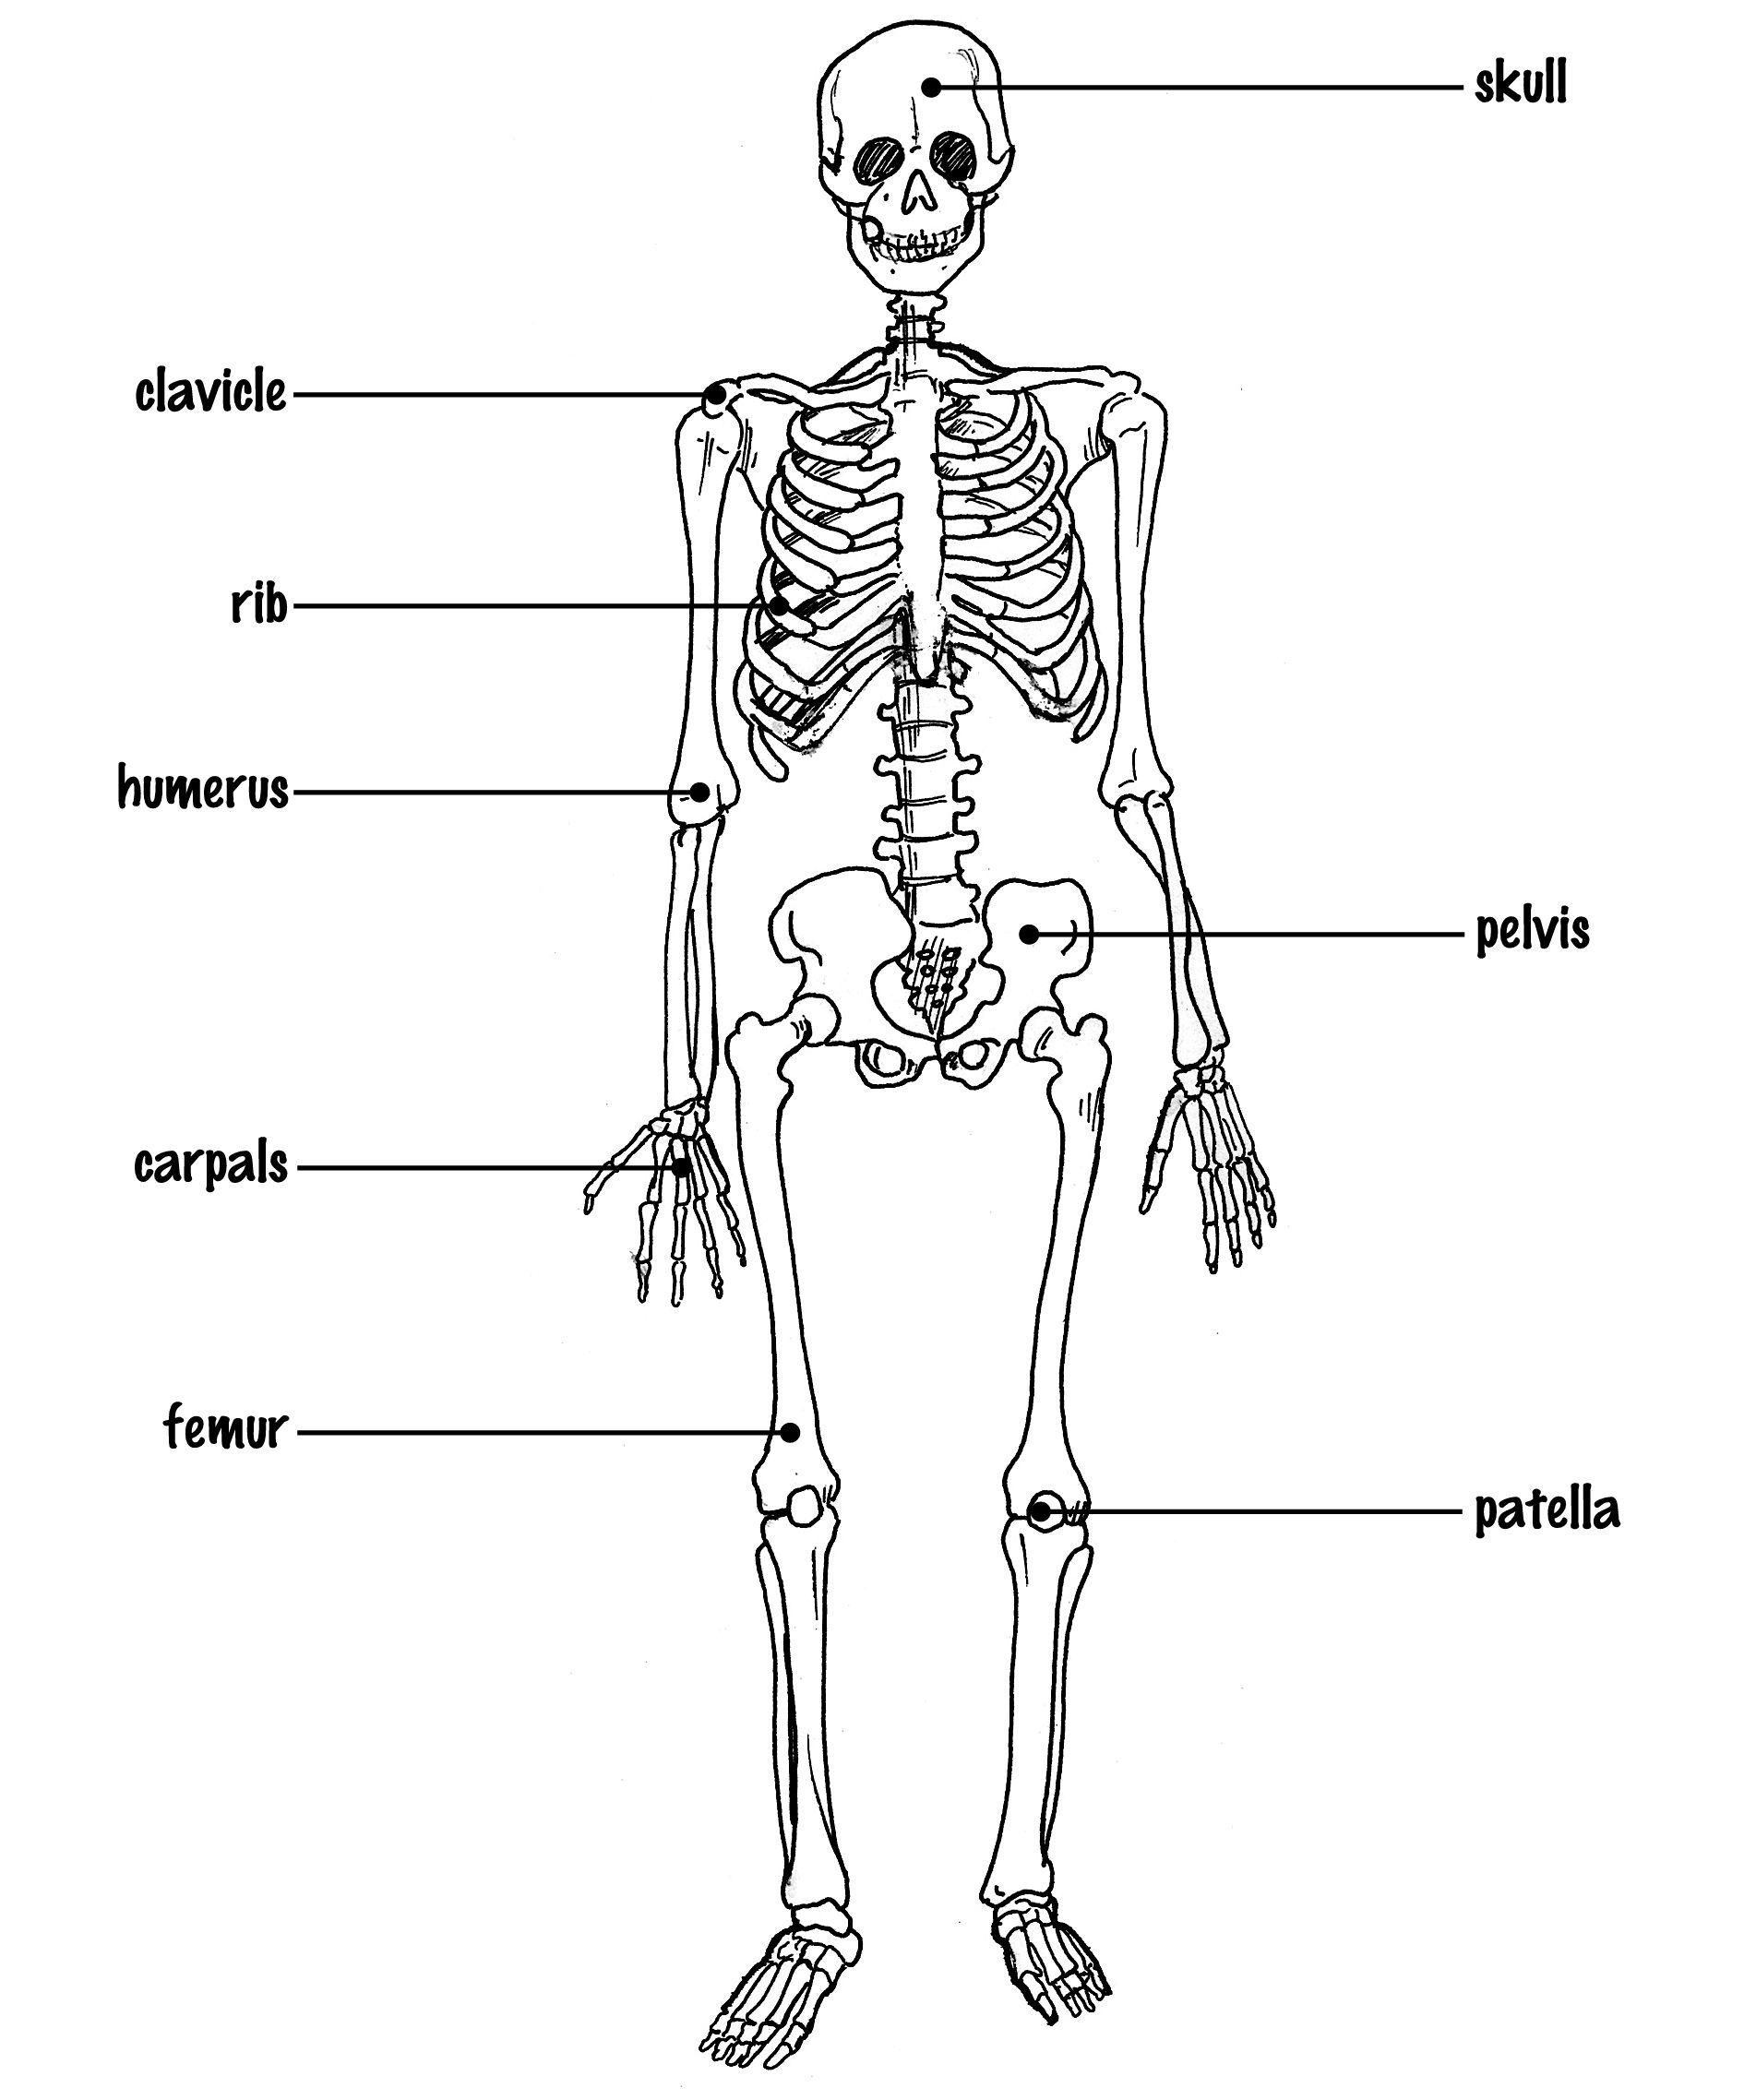 circulation diagram of organs and body